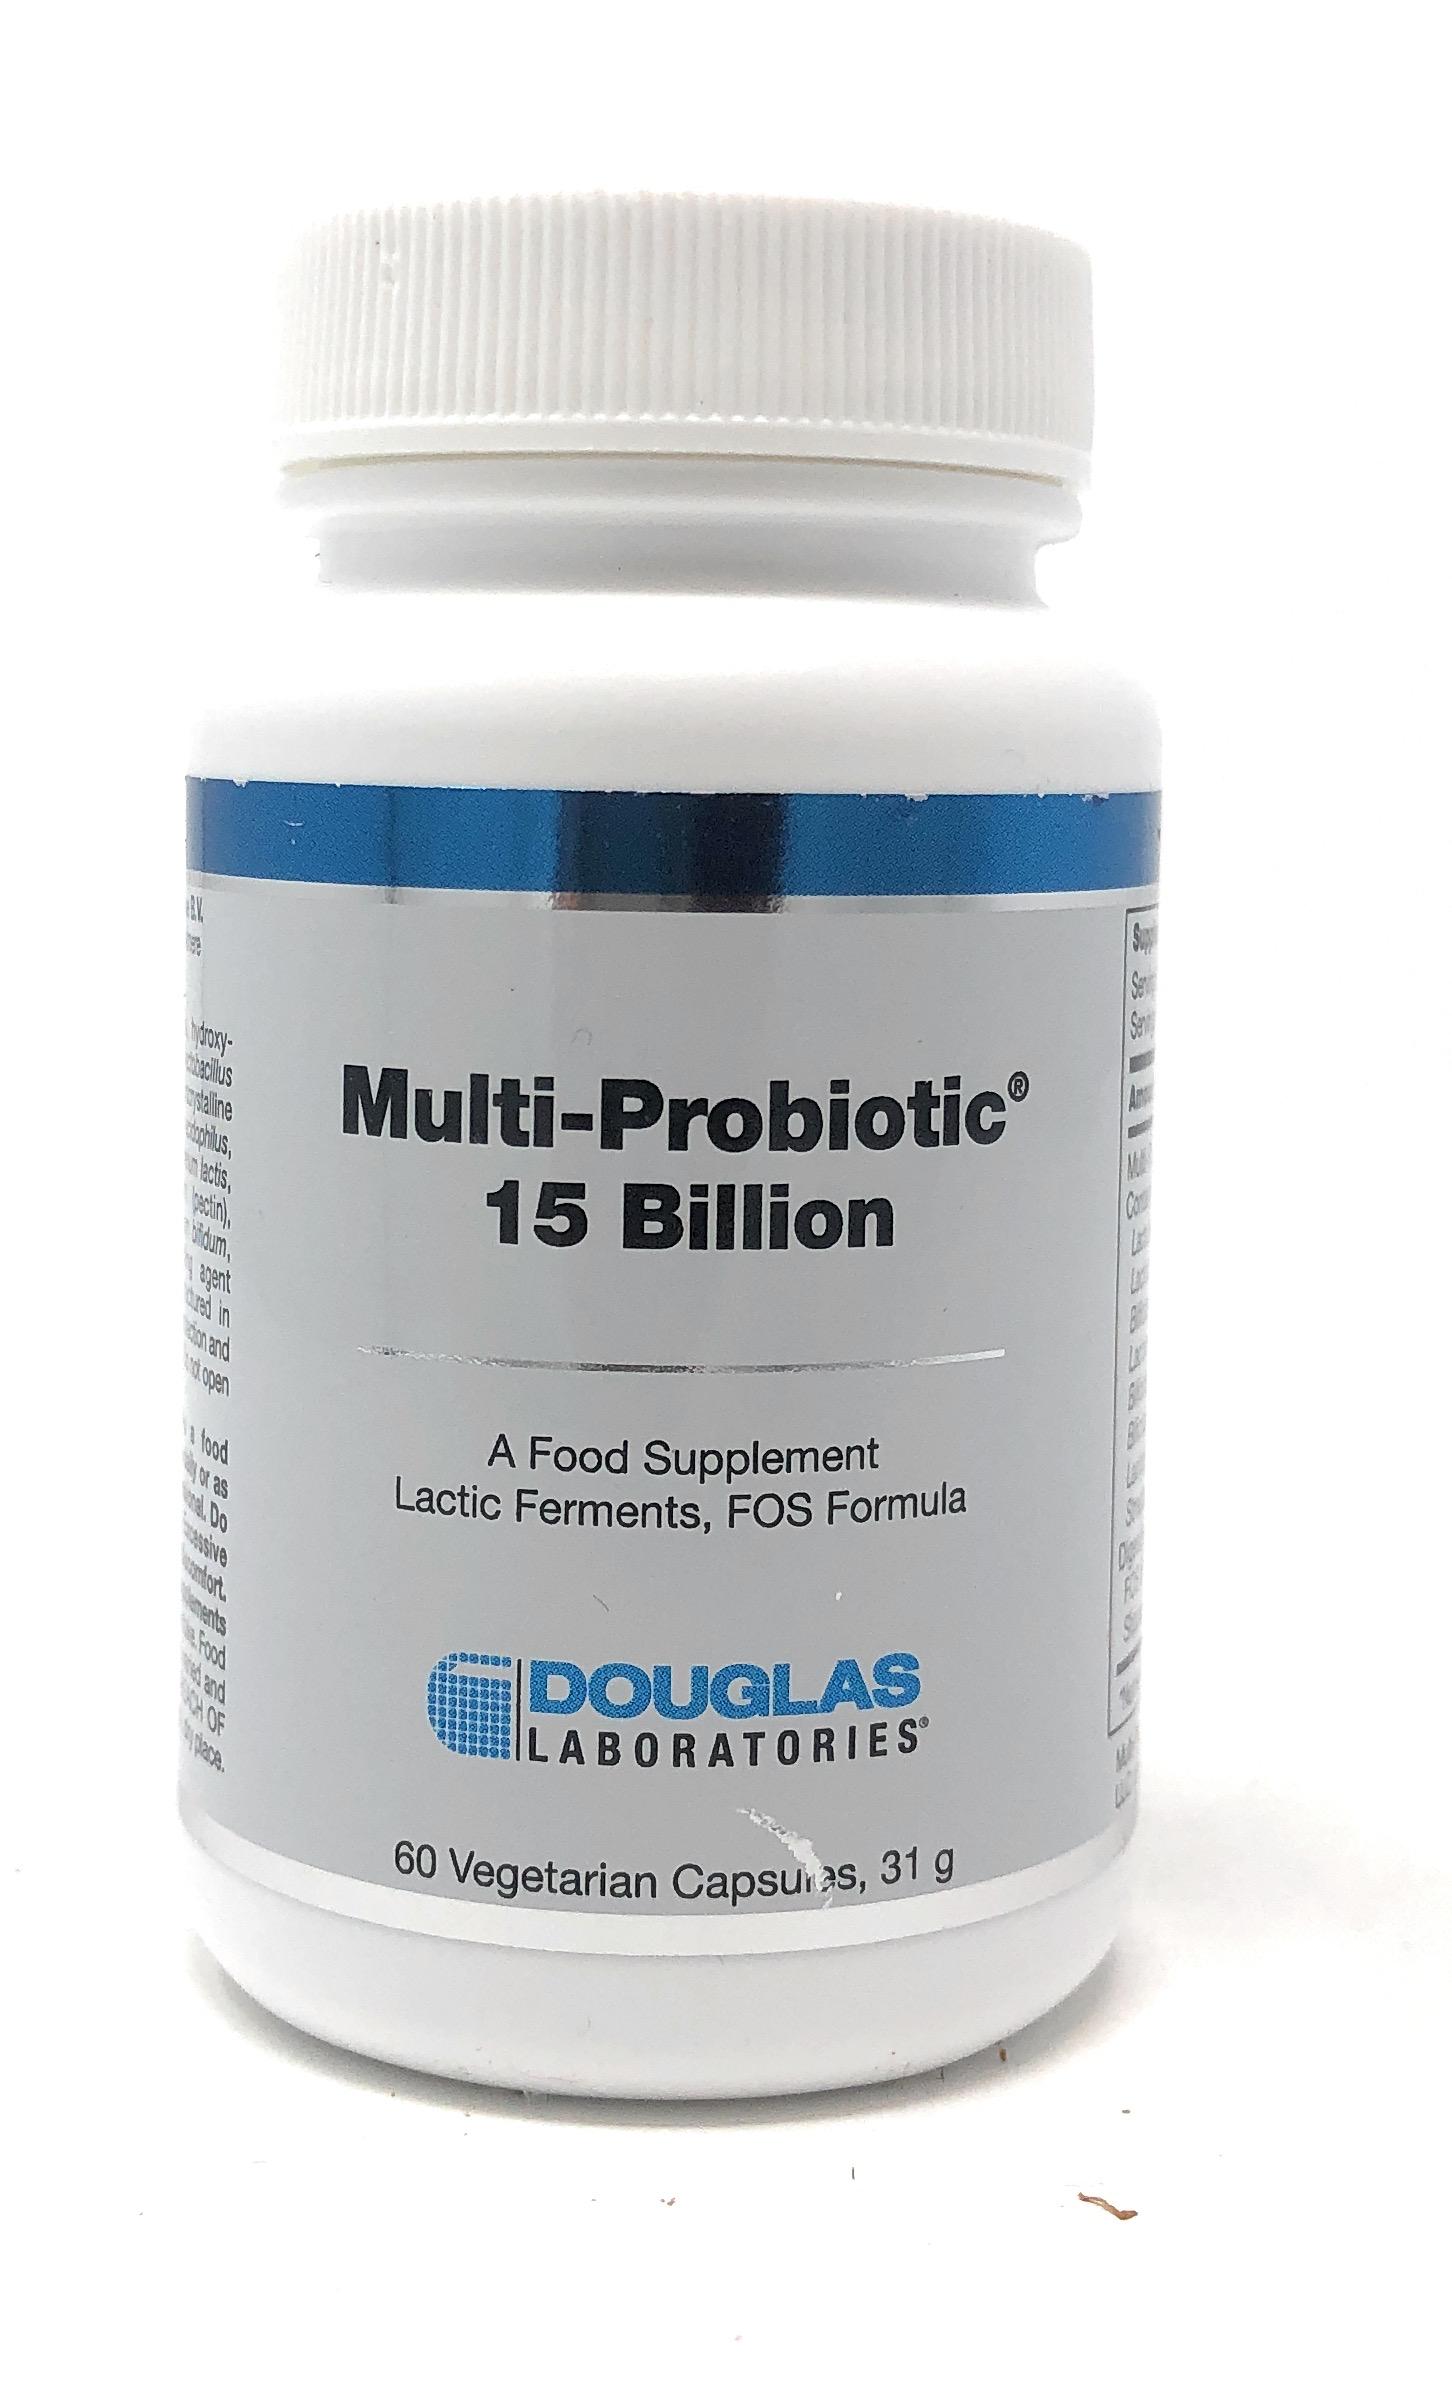 Douglas Laboratories Europe Multi-Probiotic 15 Billion 60 Kapseln (31g)